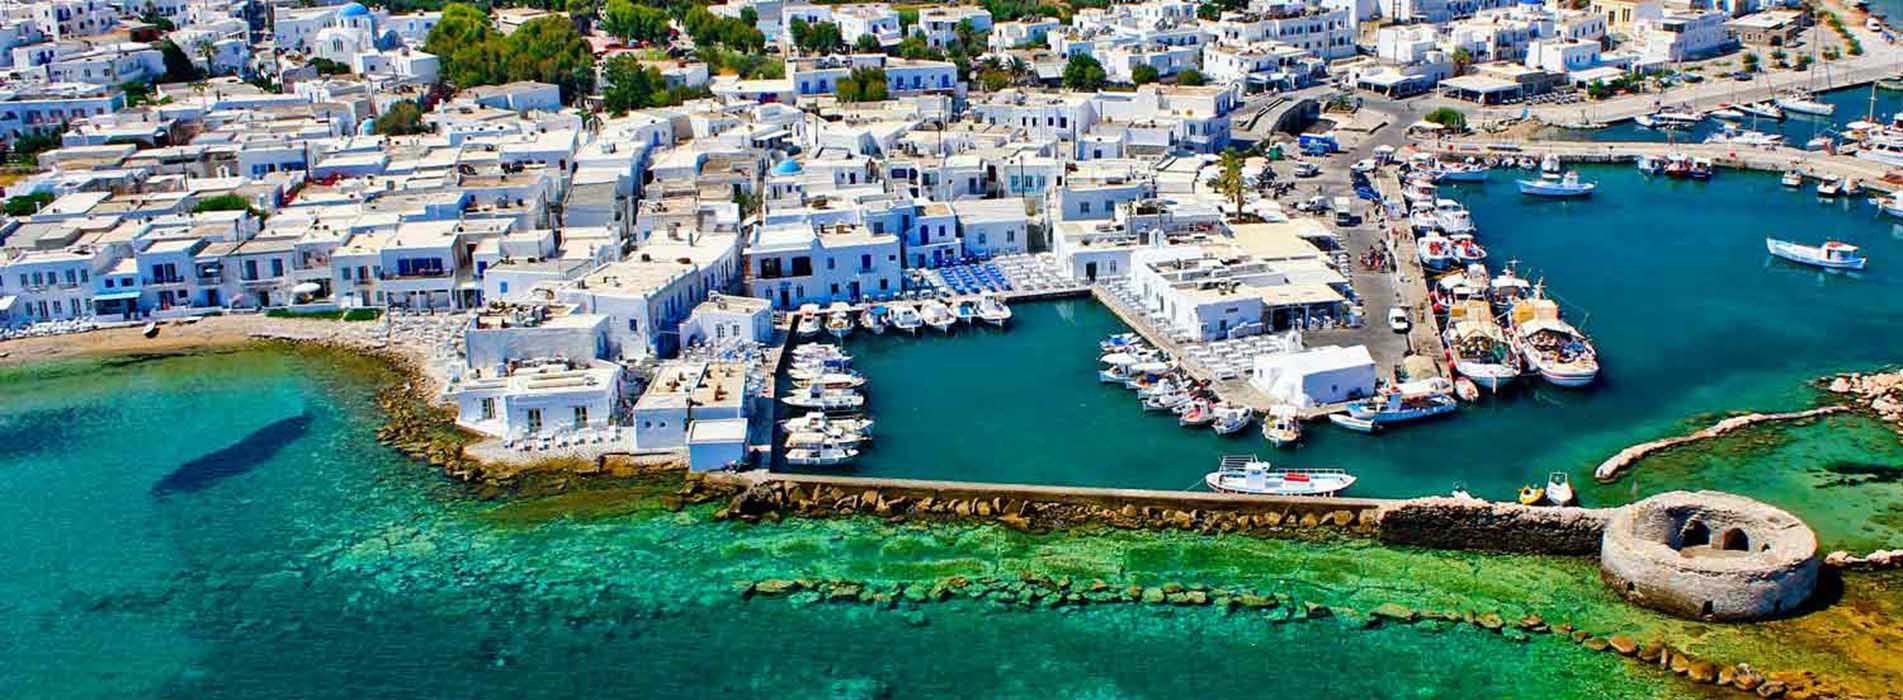 Greece - Paros 1 (main)